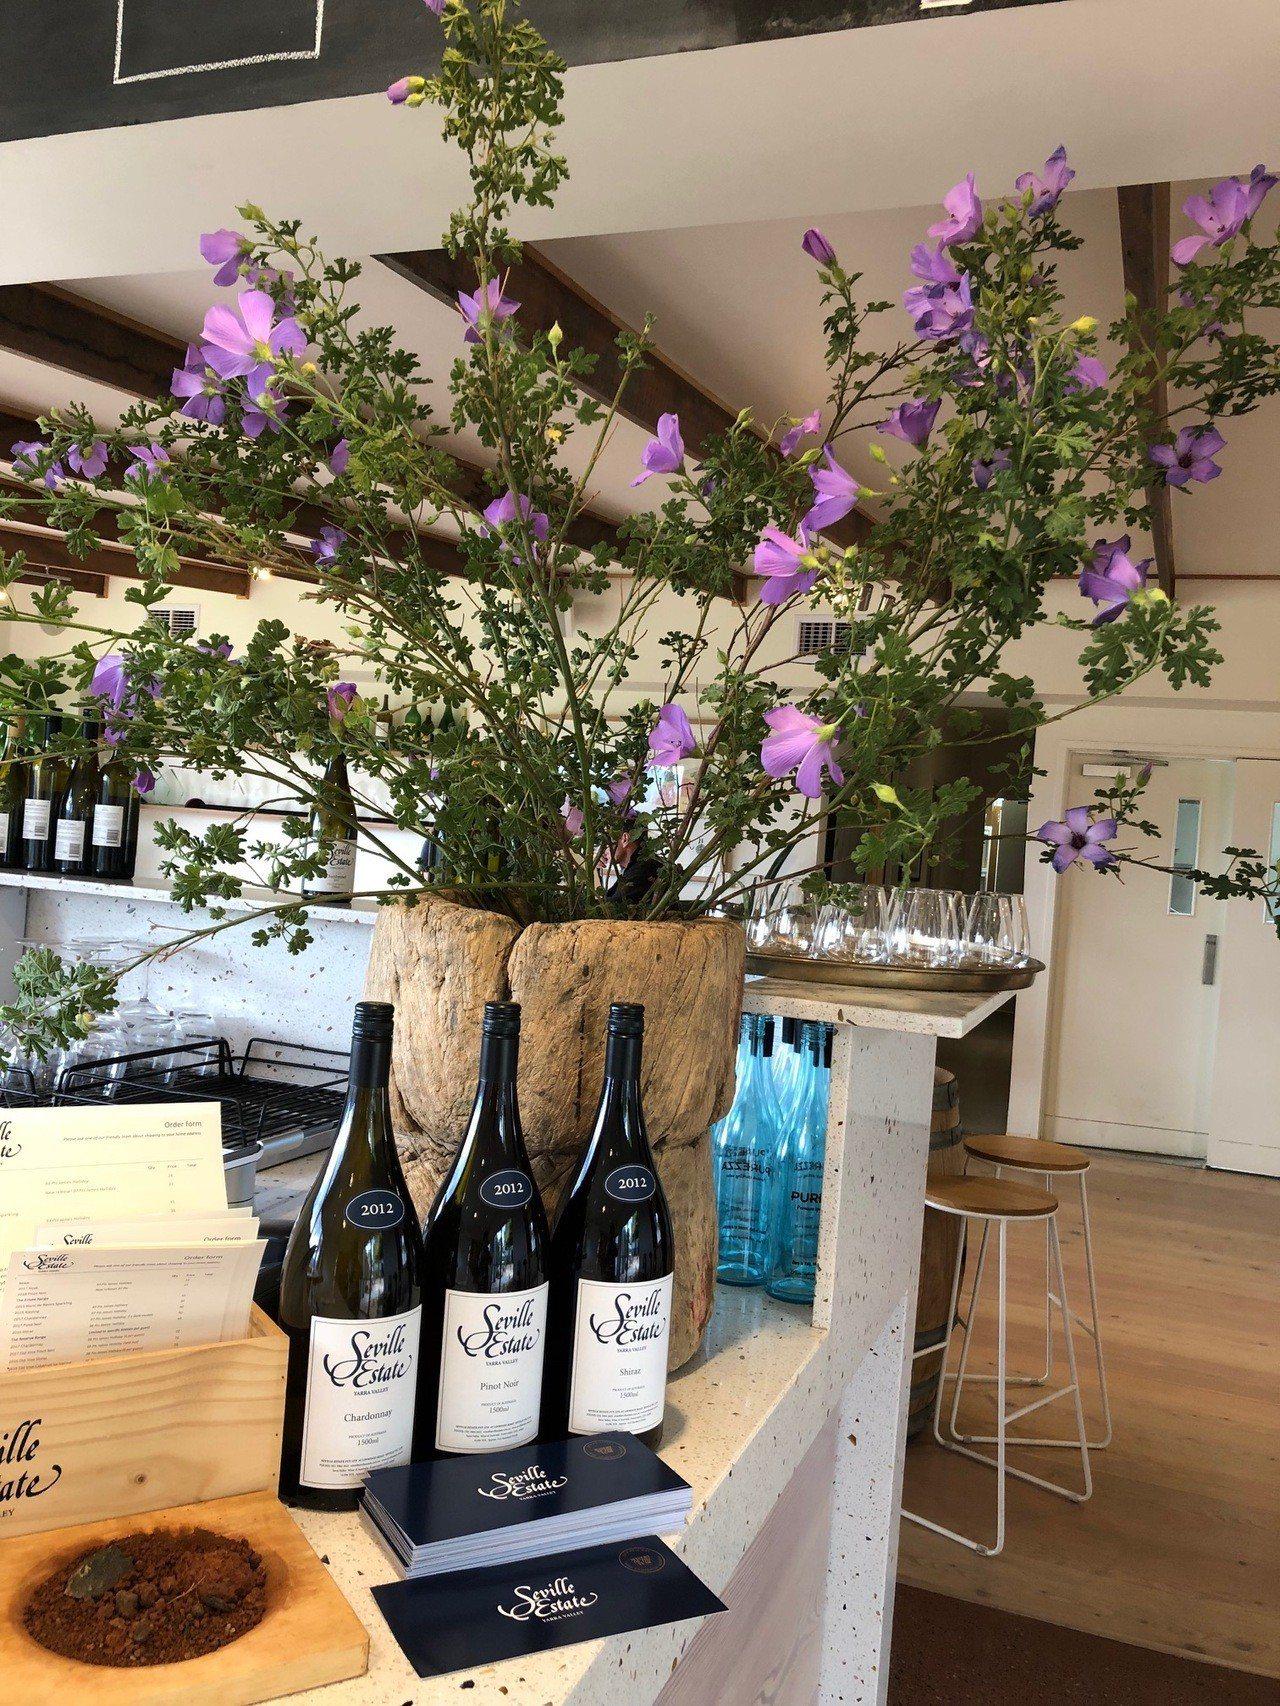 Seville Estate被評選為2018年度最佳酒莊。記者錢欽青攝影。 ※...